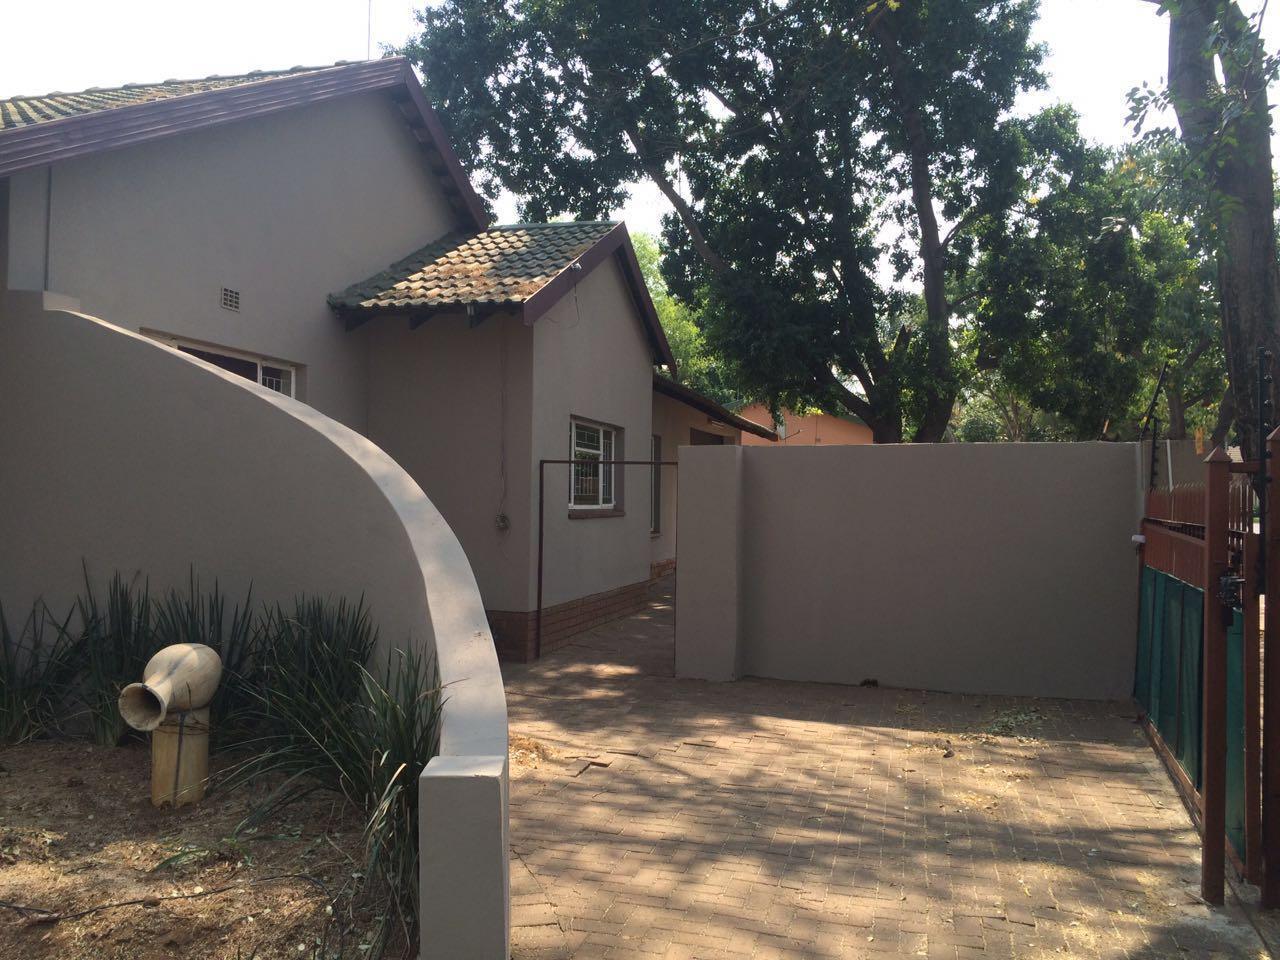 4 BedroomHouse For Sale In Geelhoutpark